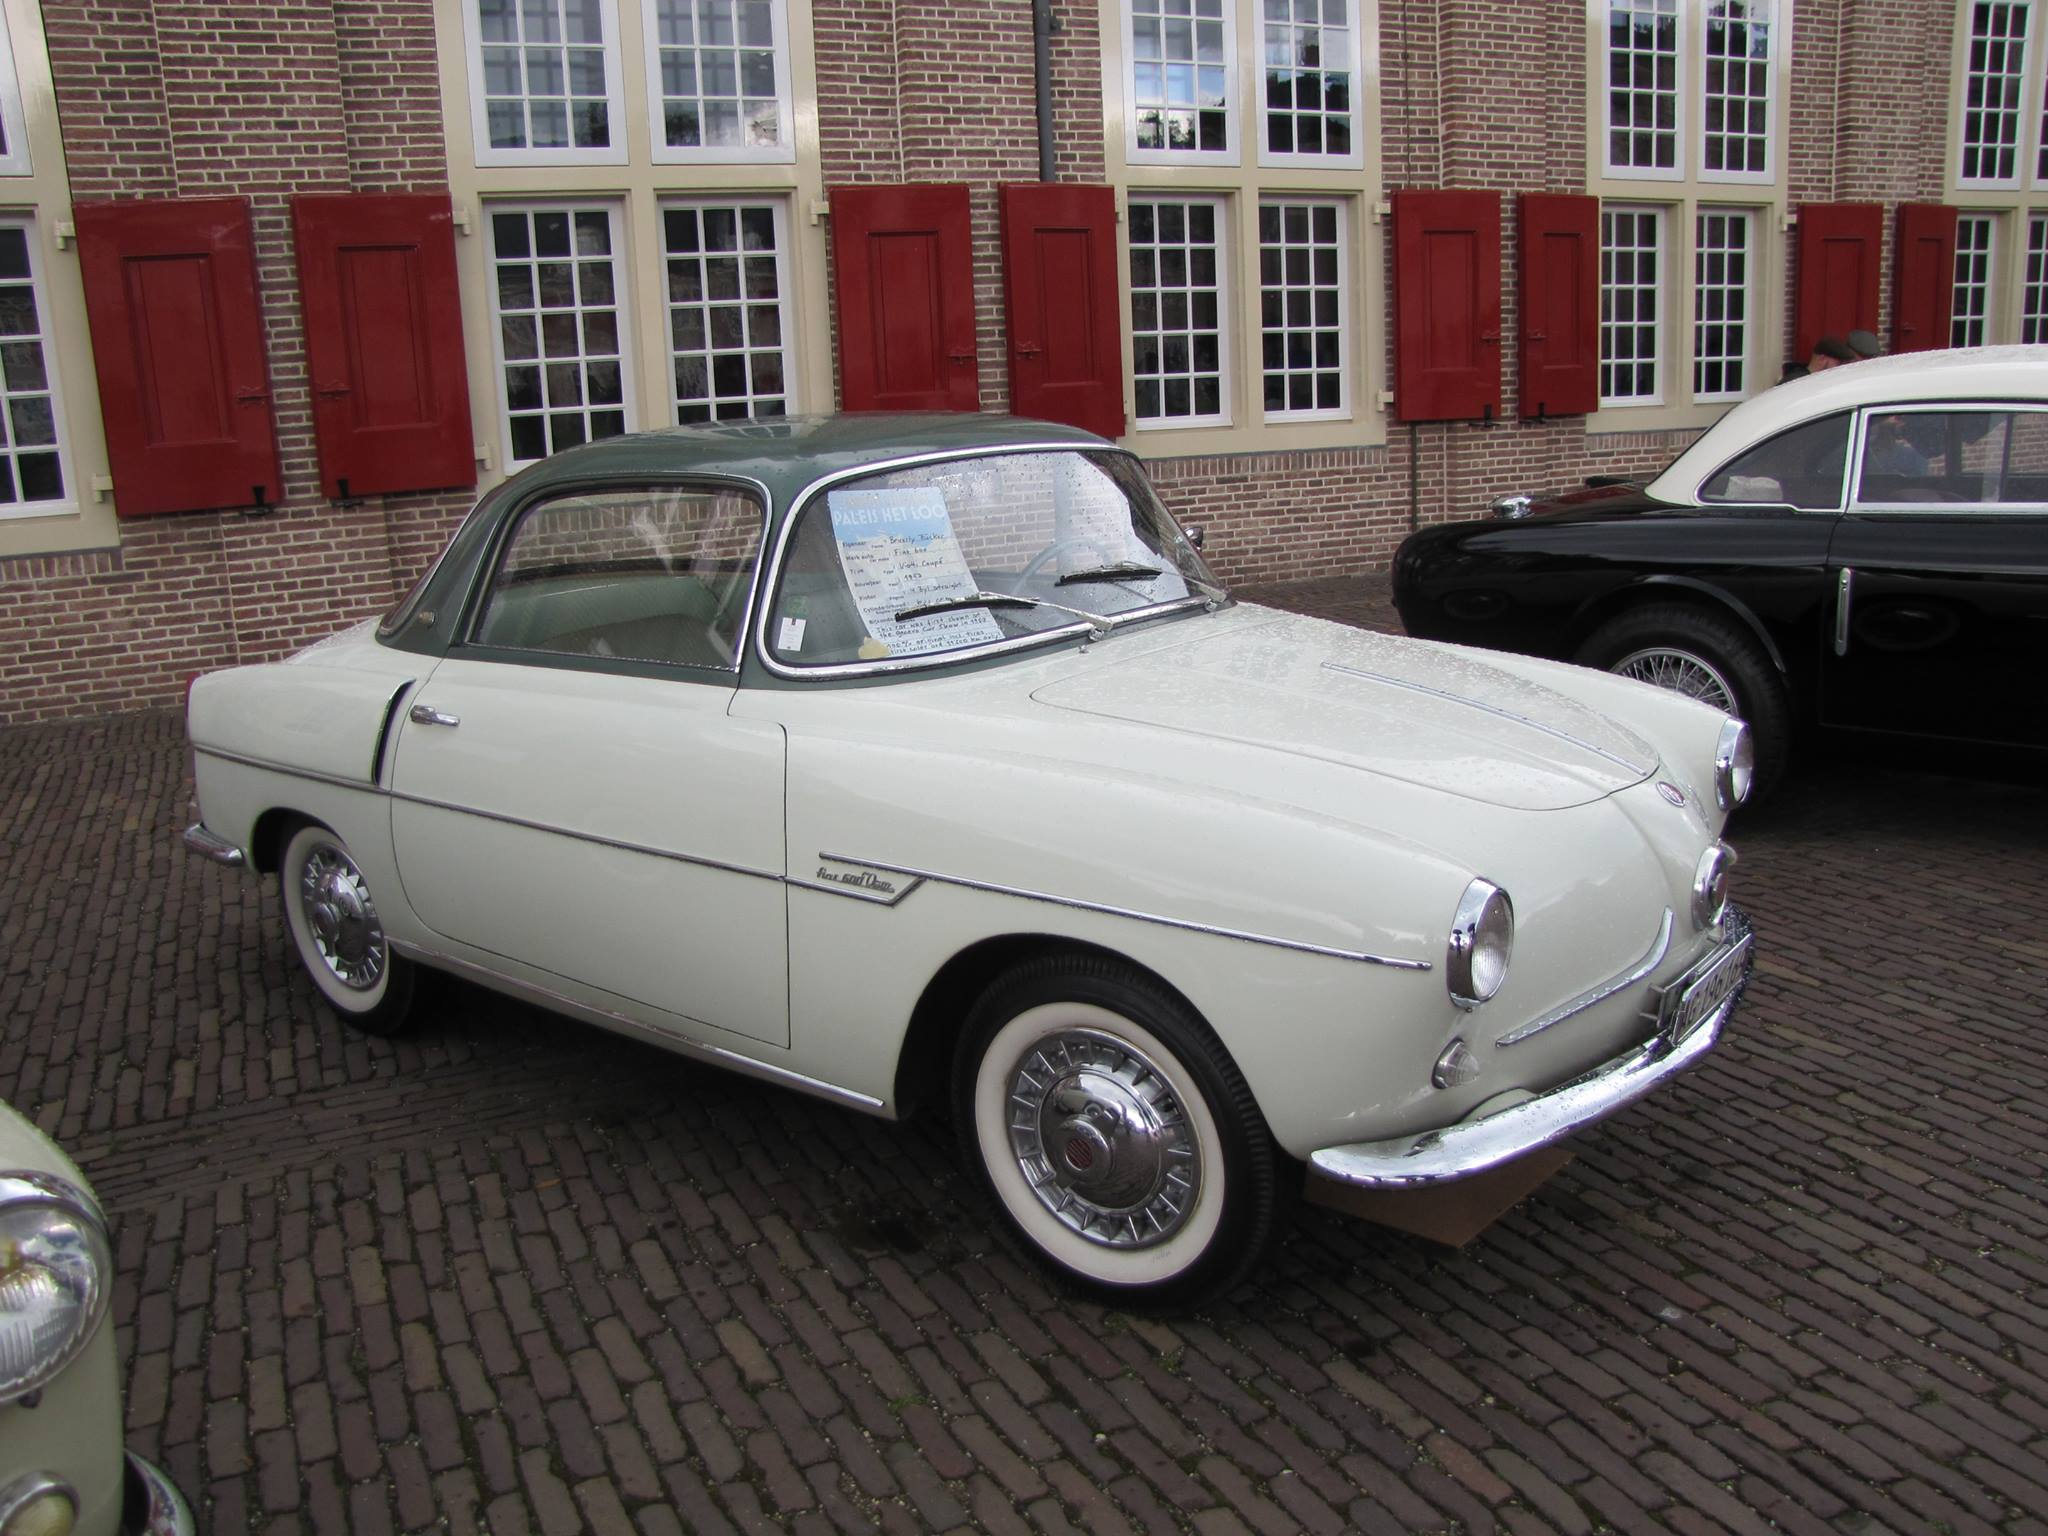 Fiat-600-coupe-van-Viotti-1